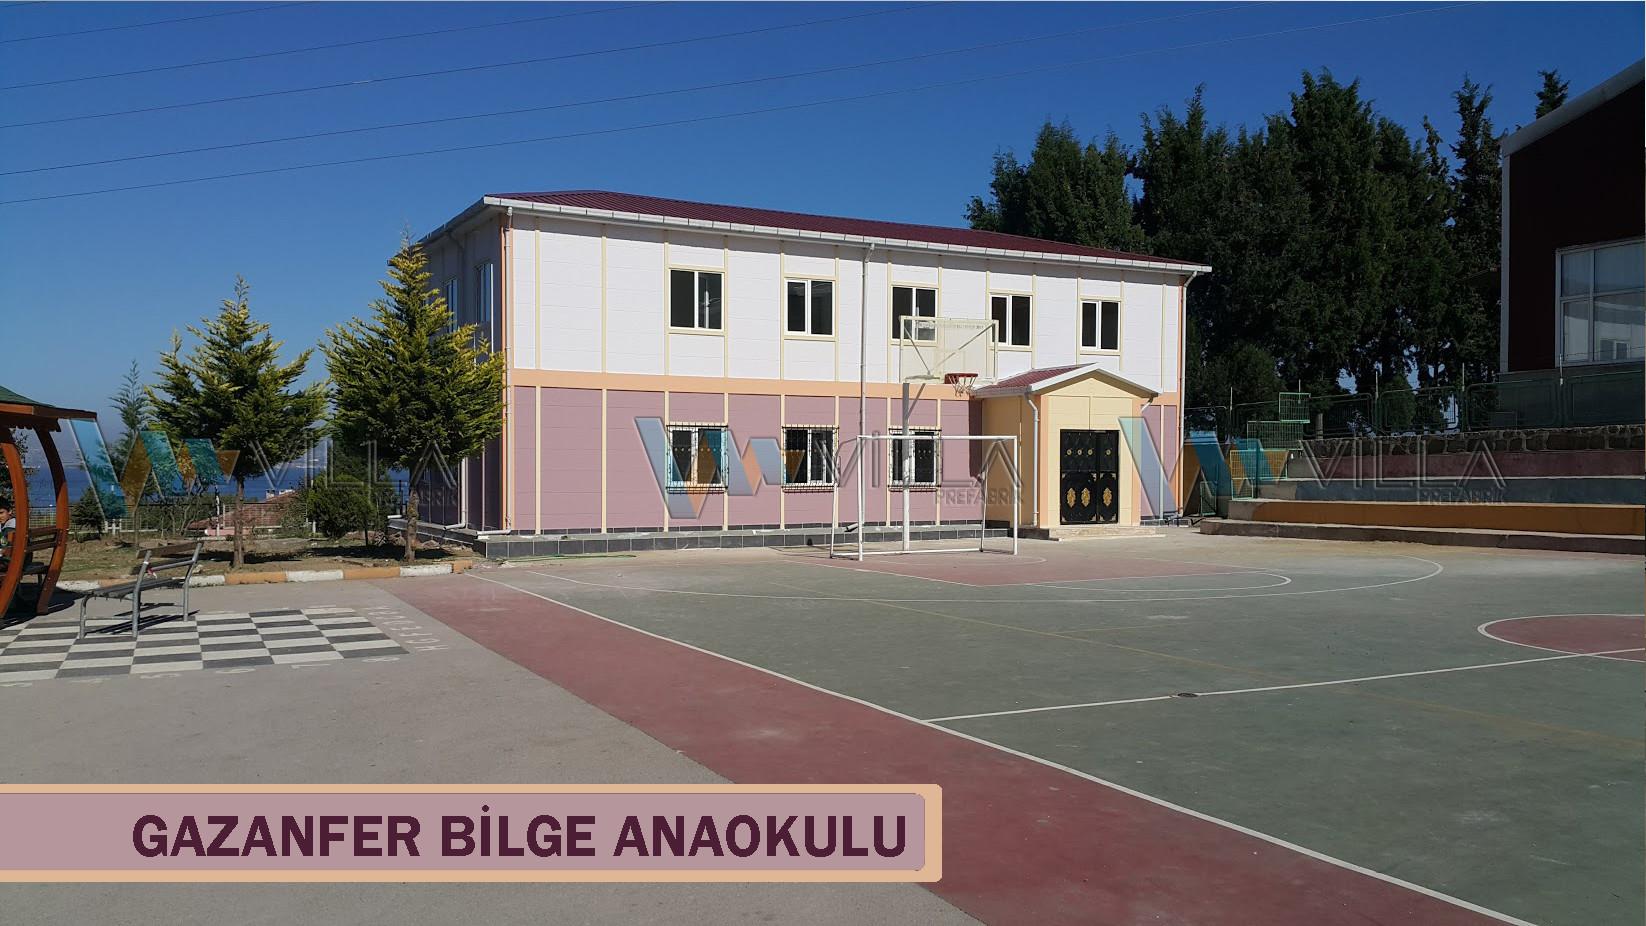 GAZANFER BİLGE ANAOKULU